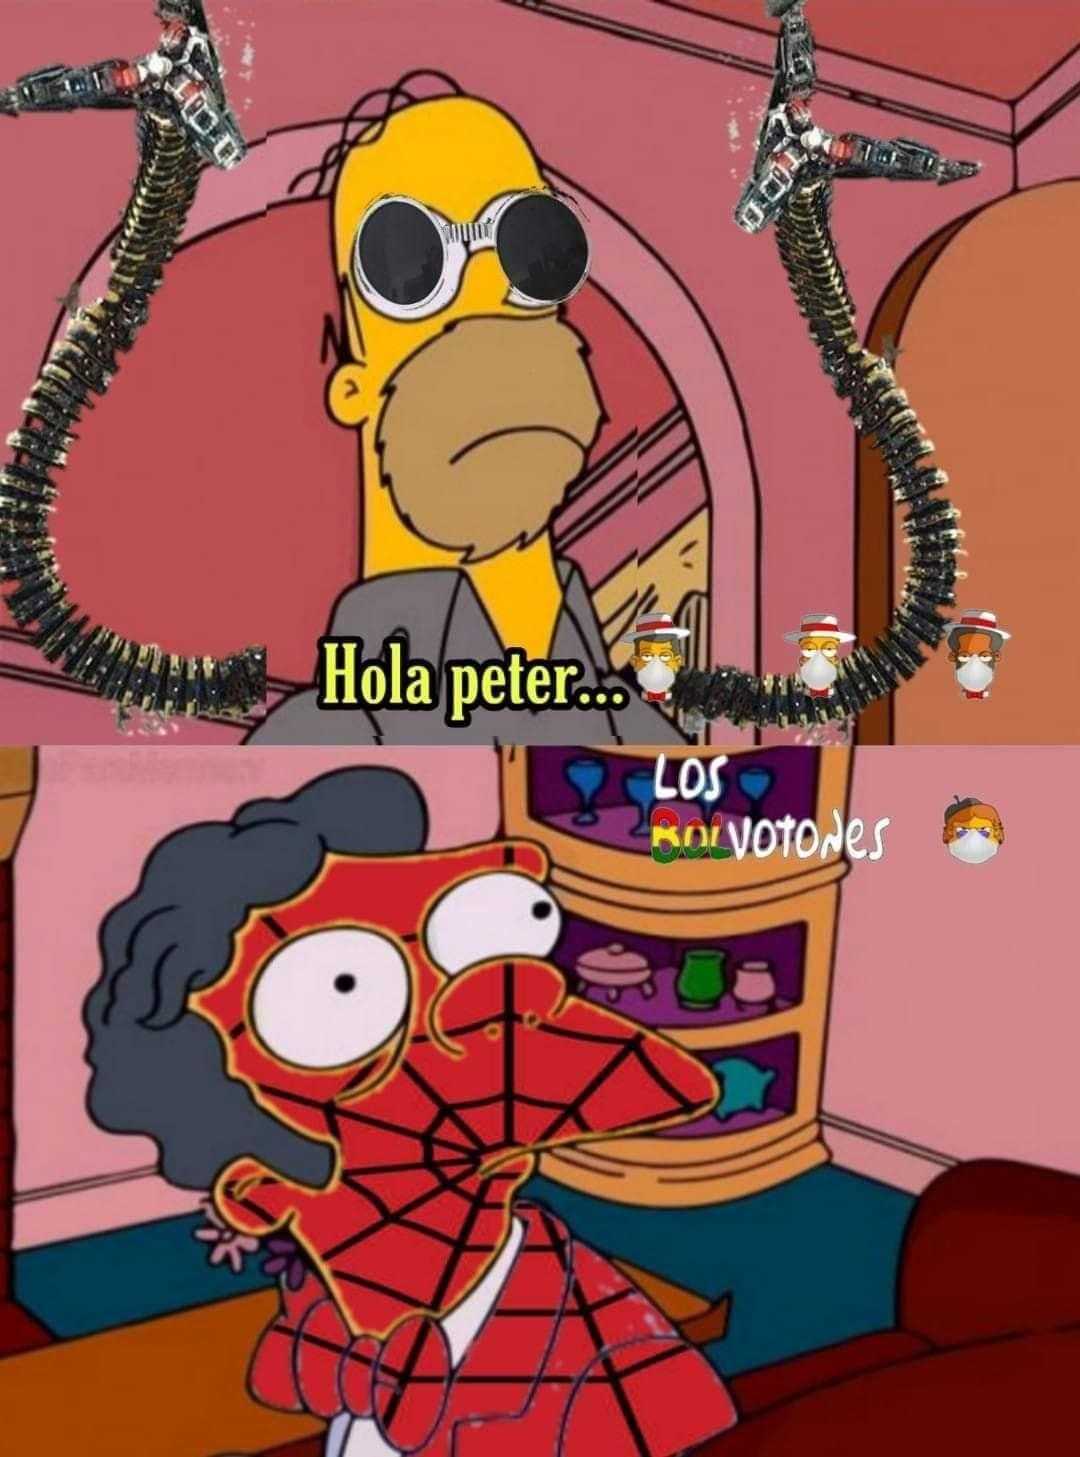 Hola, Peter